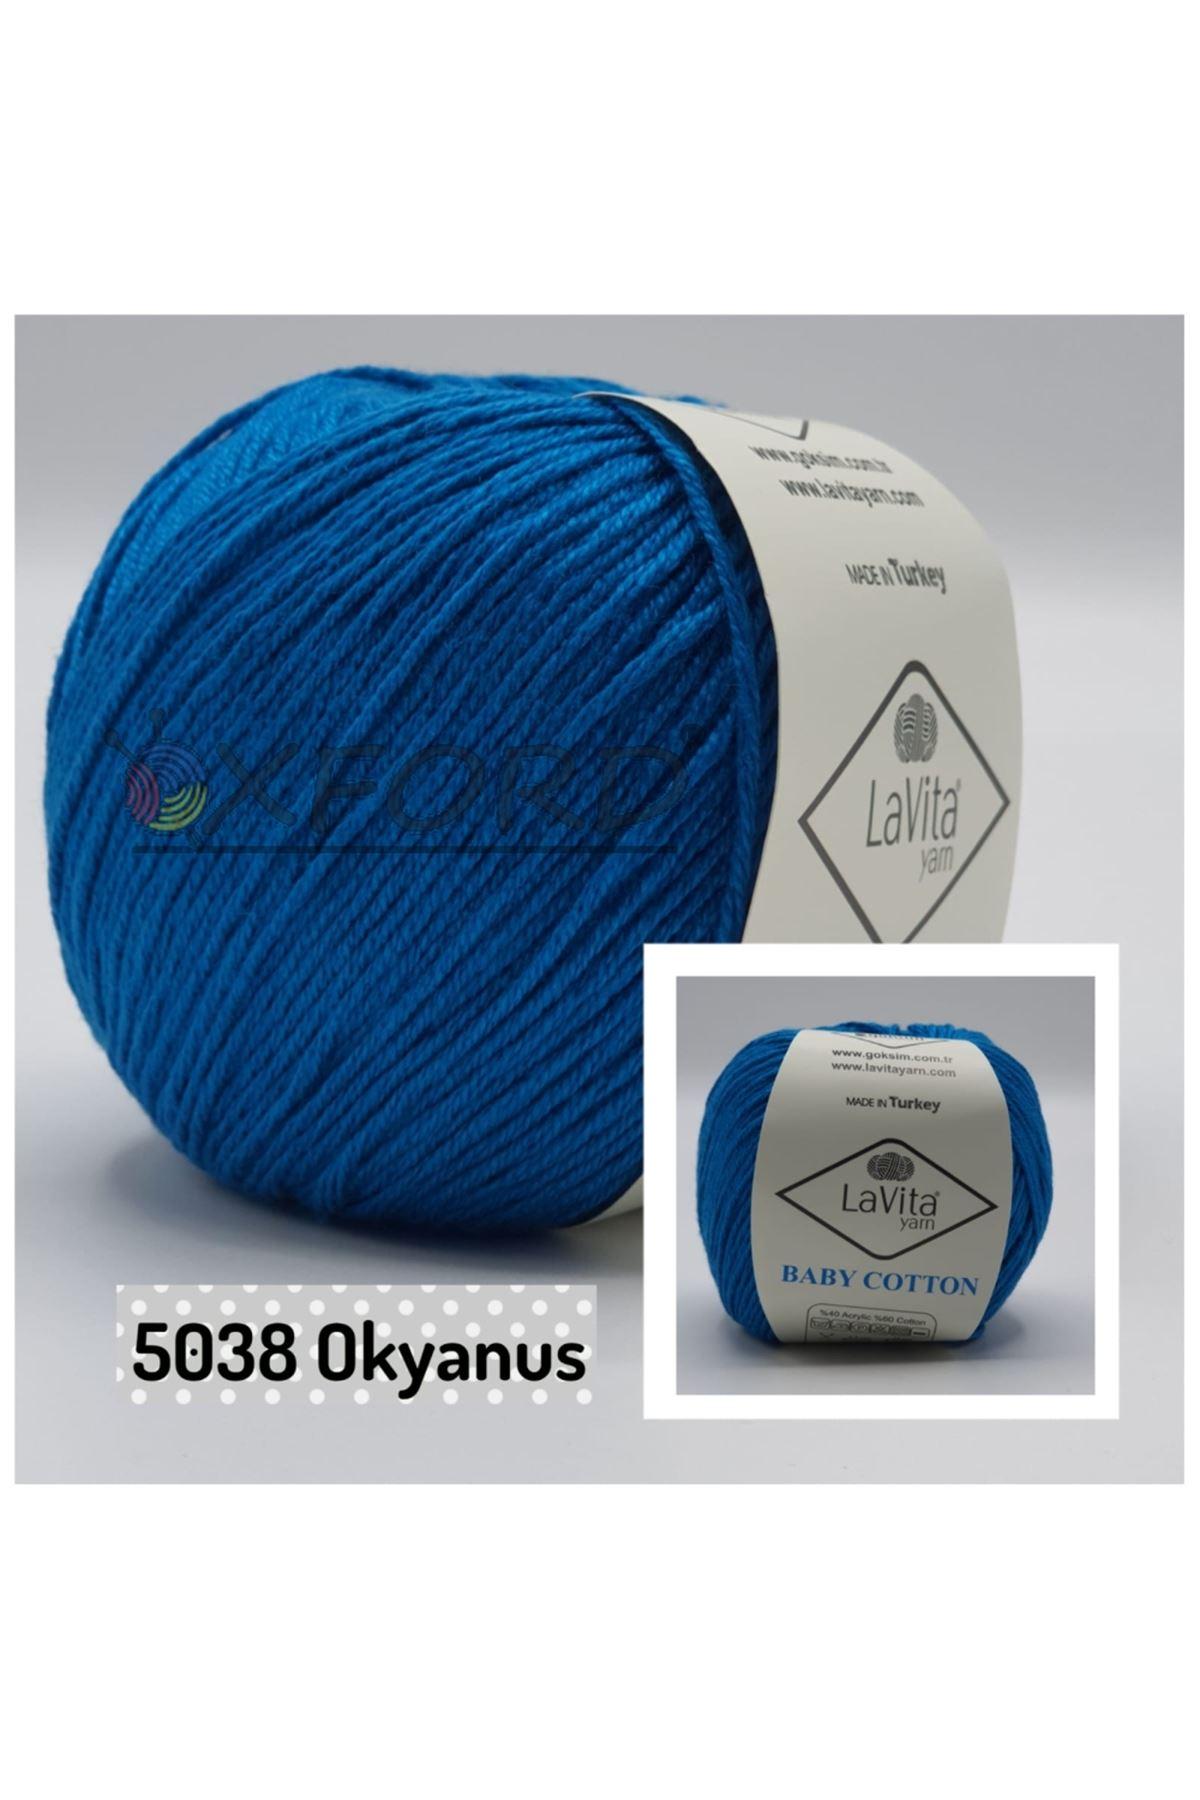 Lavita Baby Cotton 5038 Okyanus